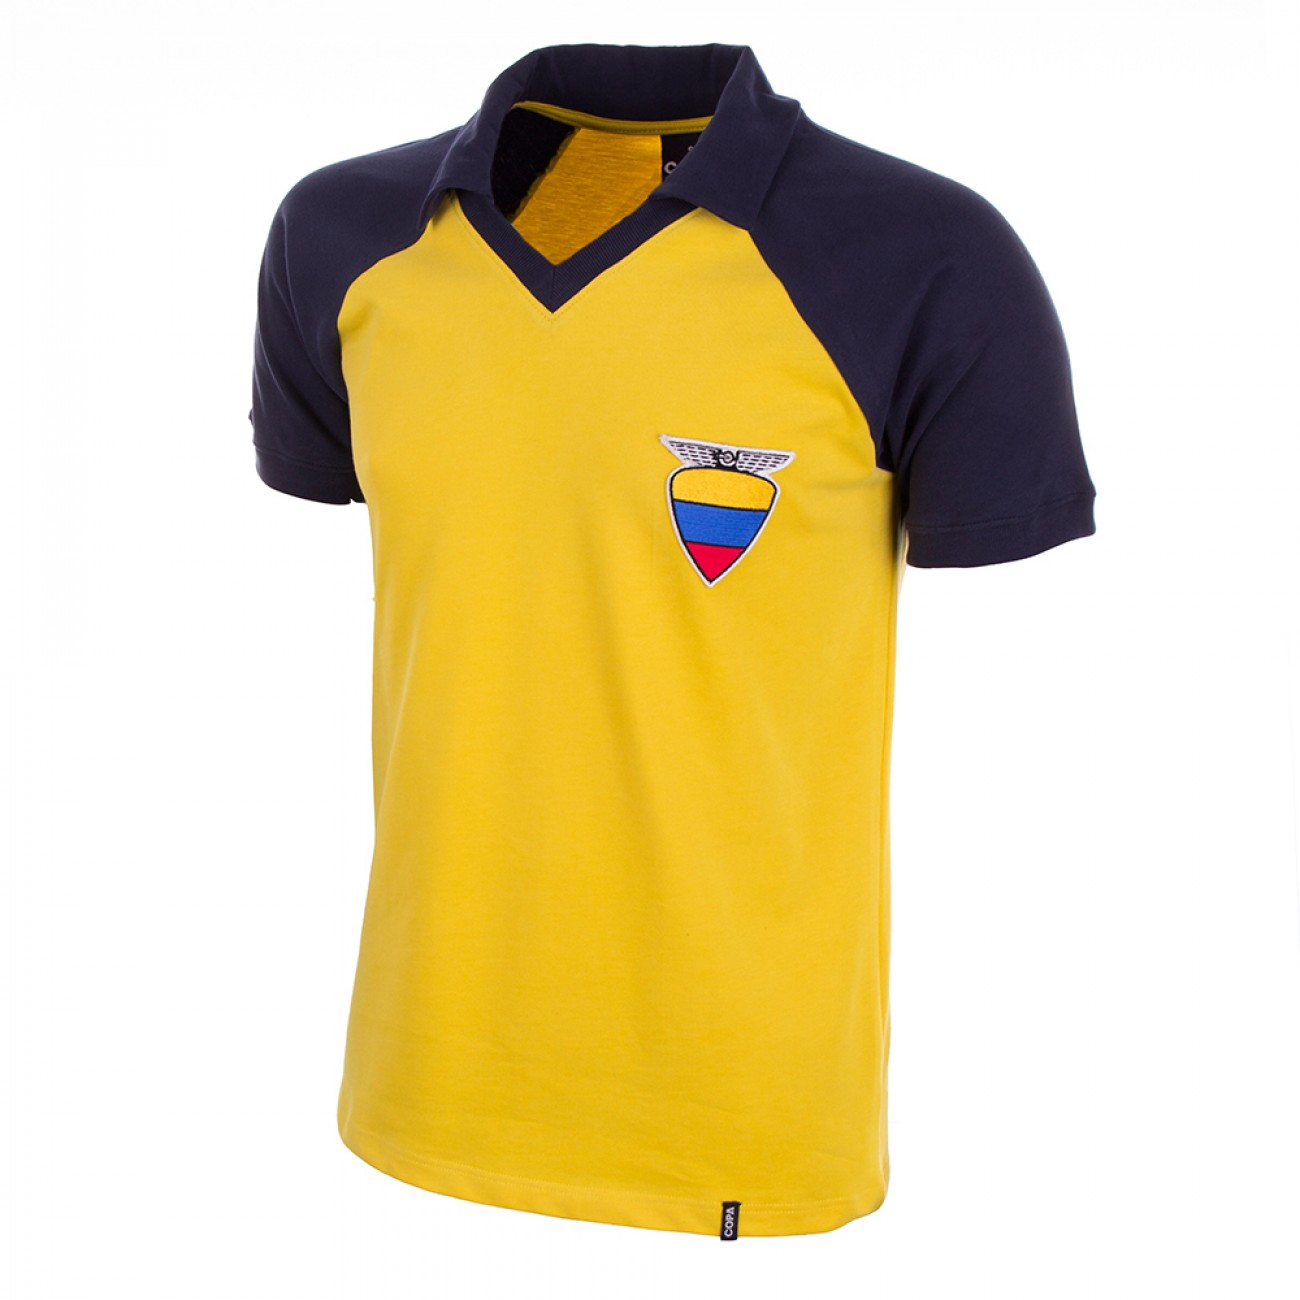 http://www.retrofootball.es/ropa-de-futbol/camiseta-ecuador-1980.html